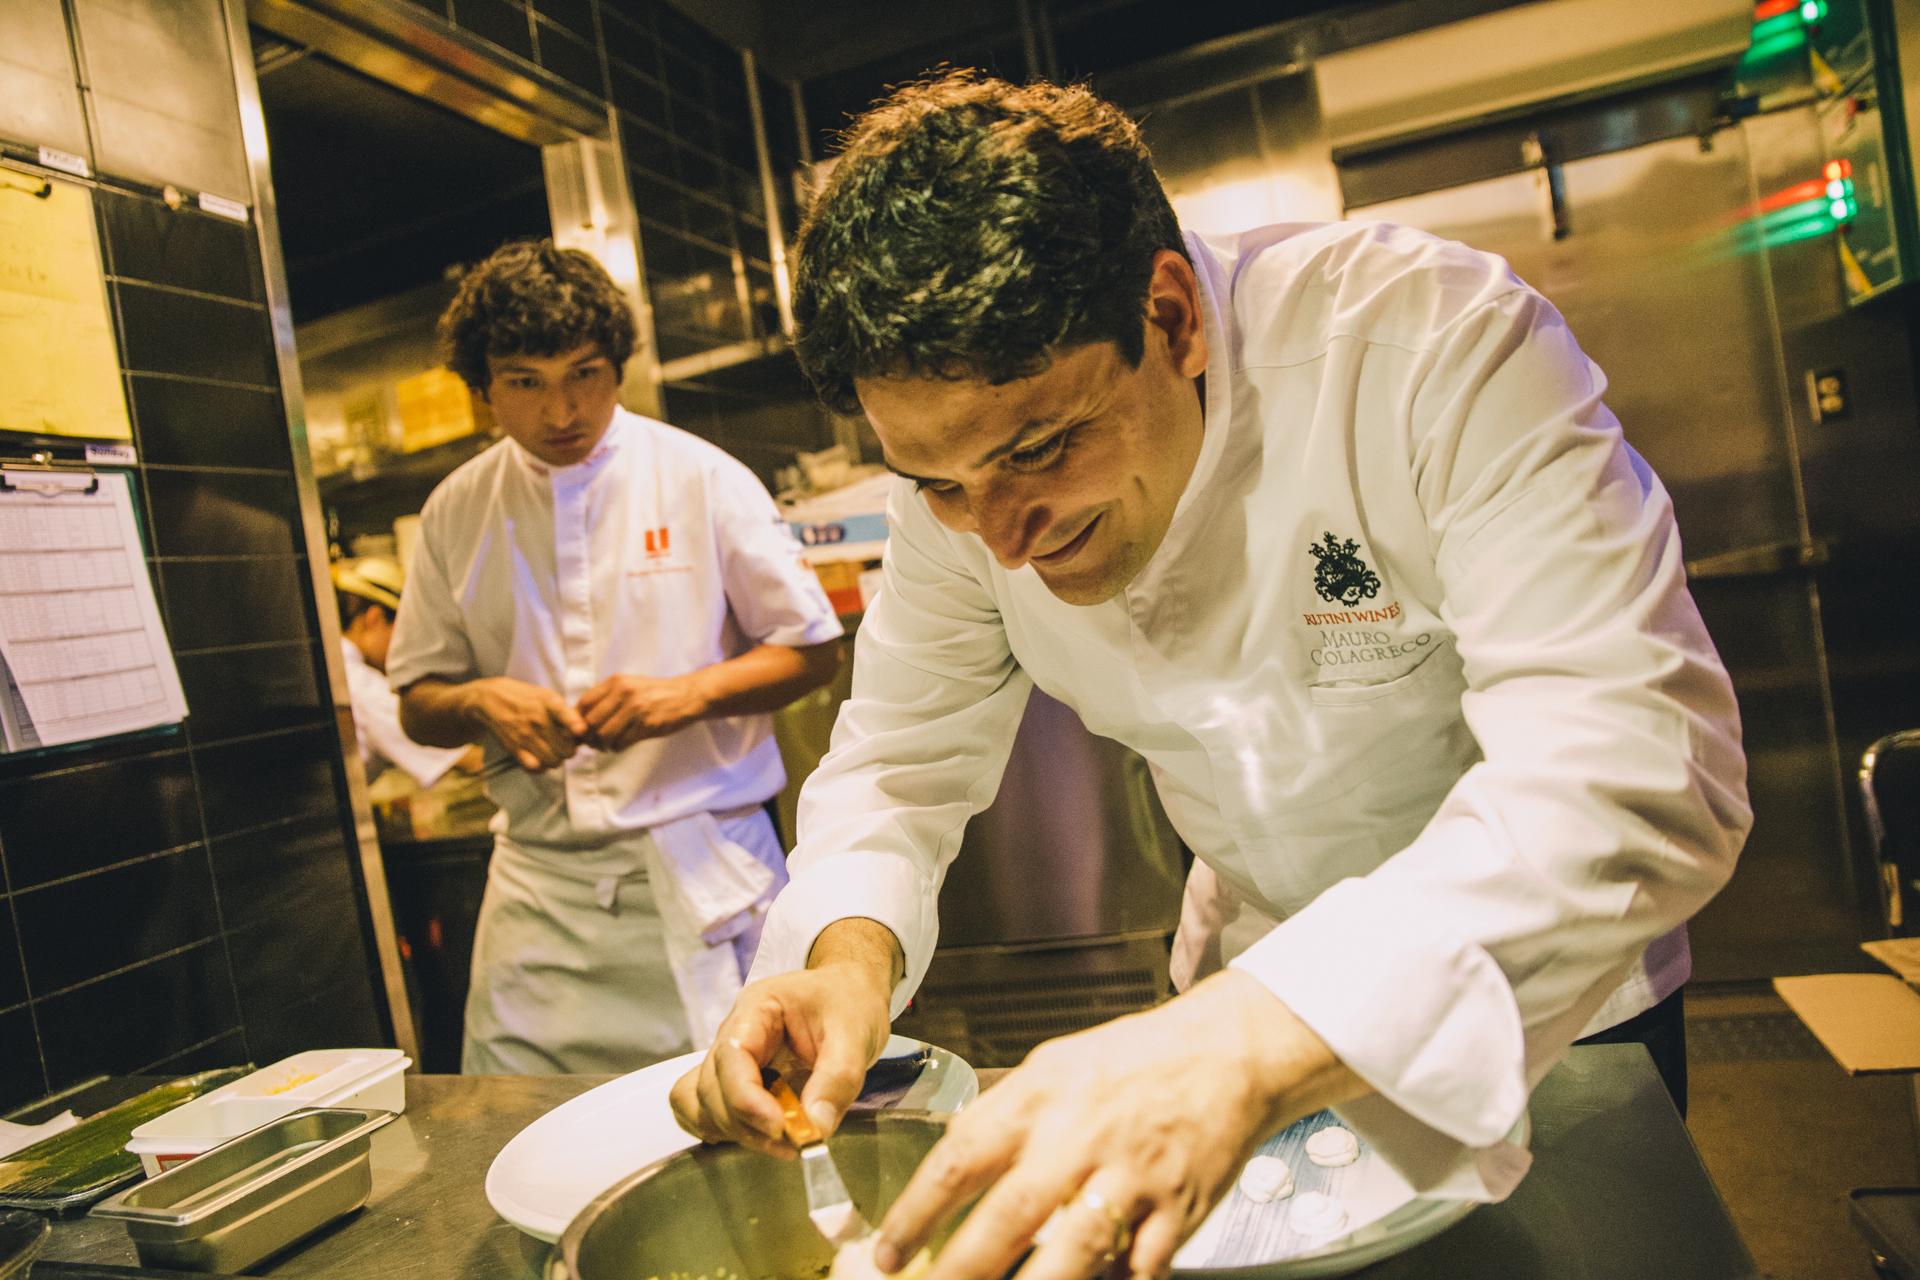 Mauro Colagreco: Unico's chef talks 50th best restaurant list and losing his temper in the kitchen